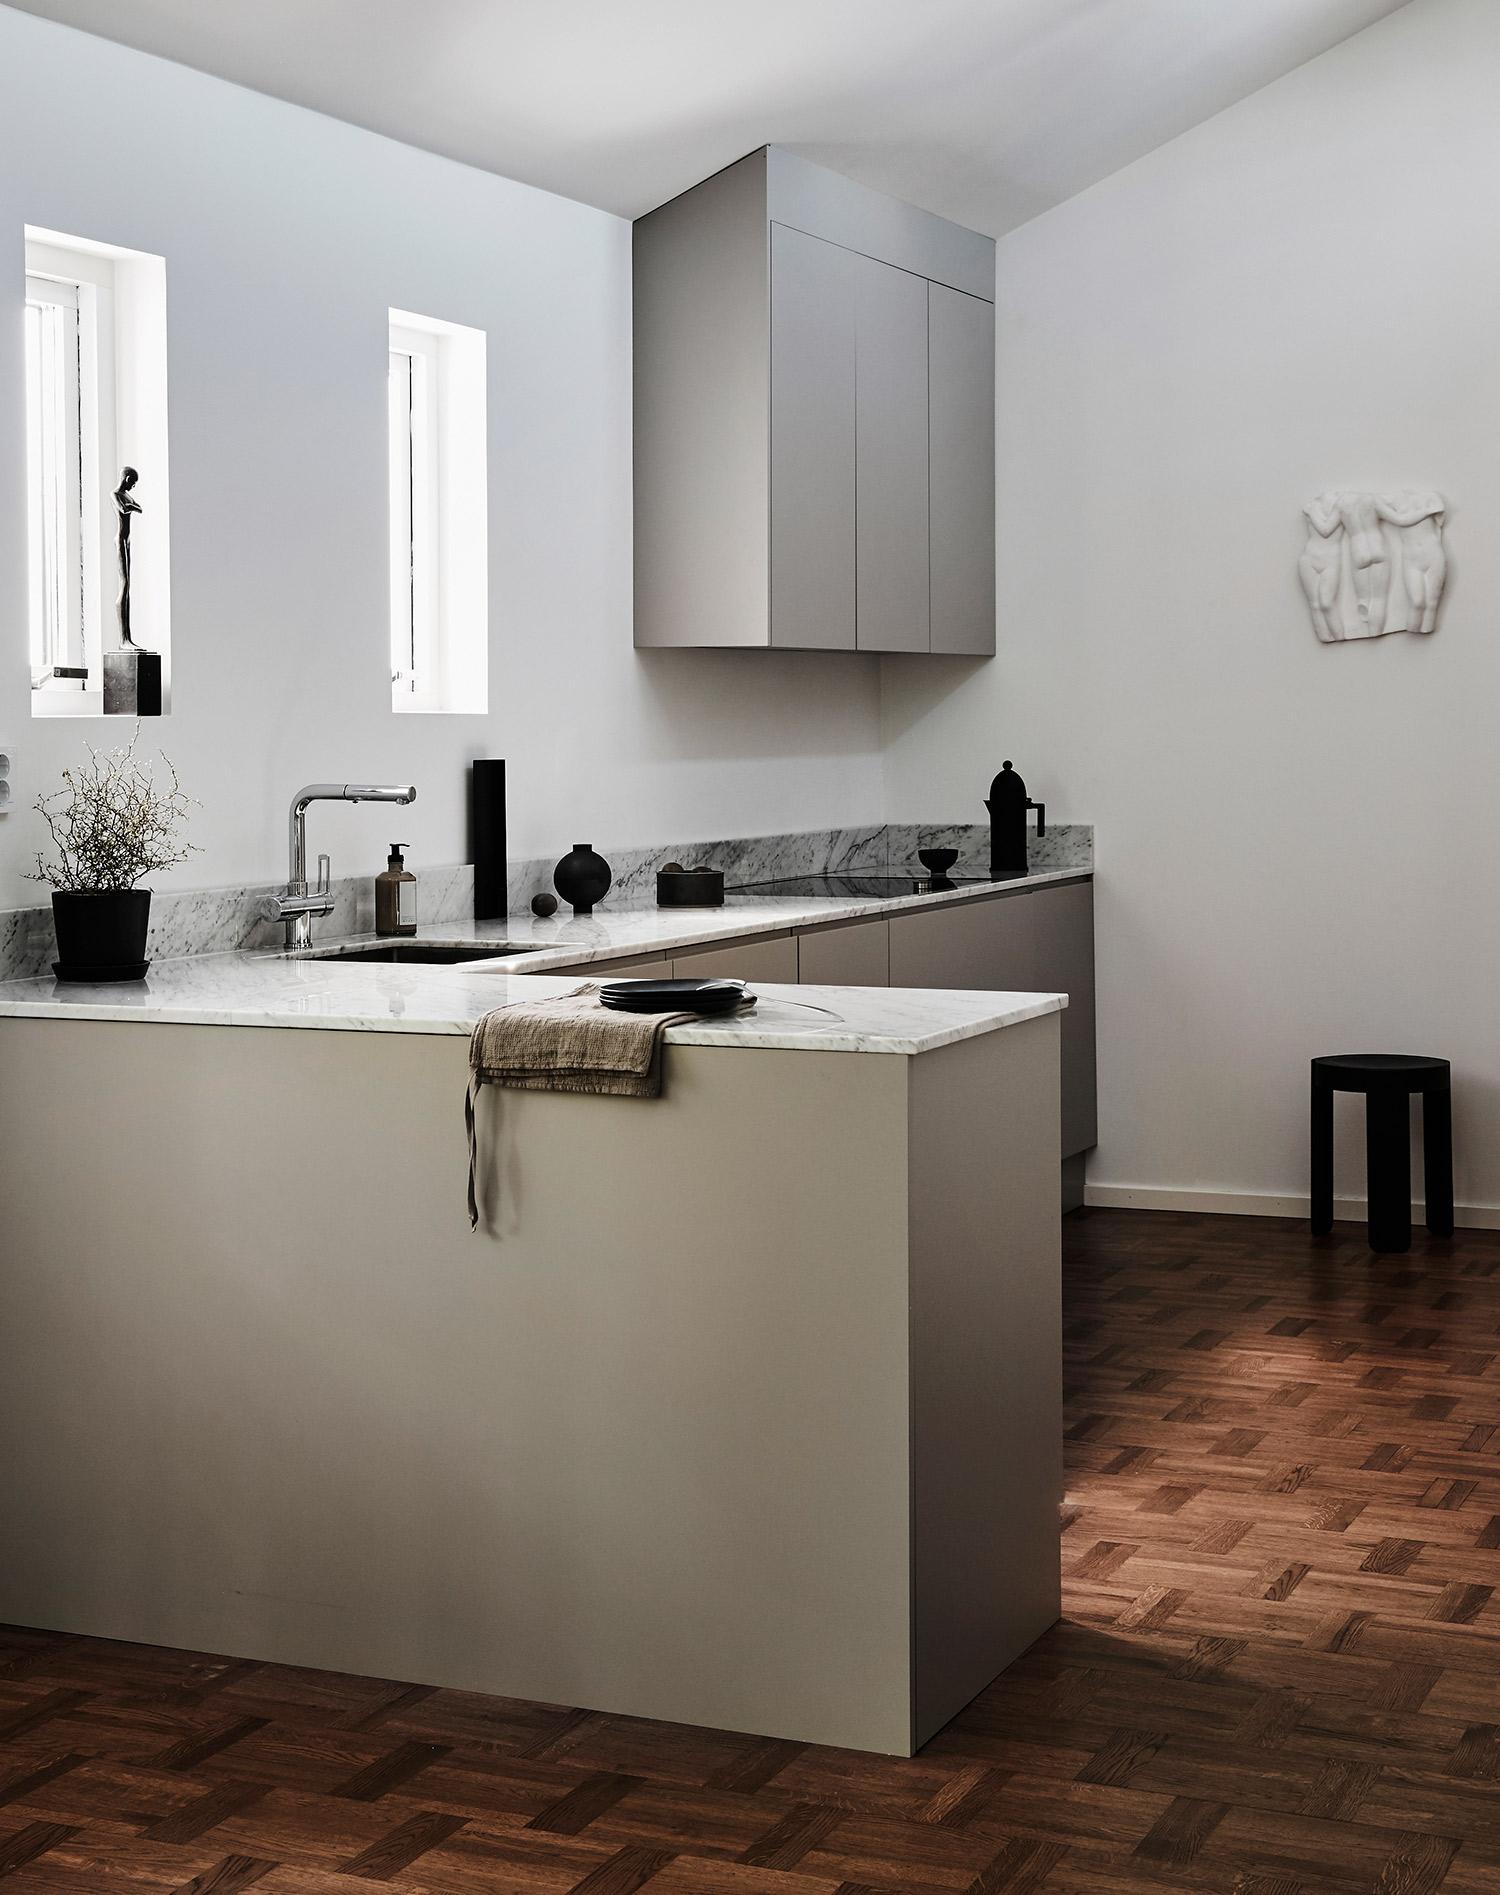 Minimalist kitchens -